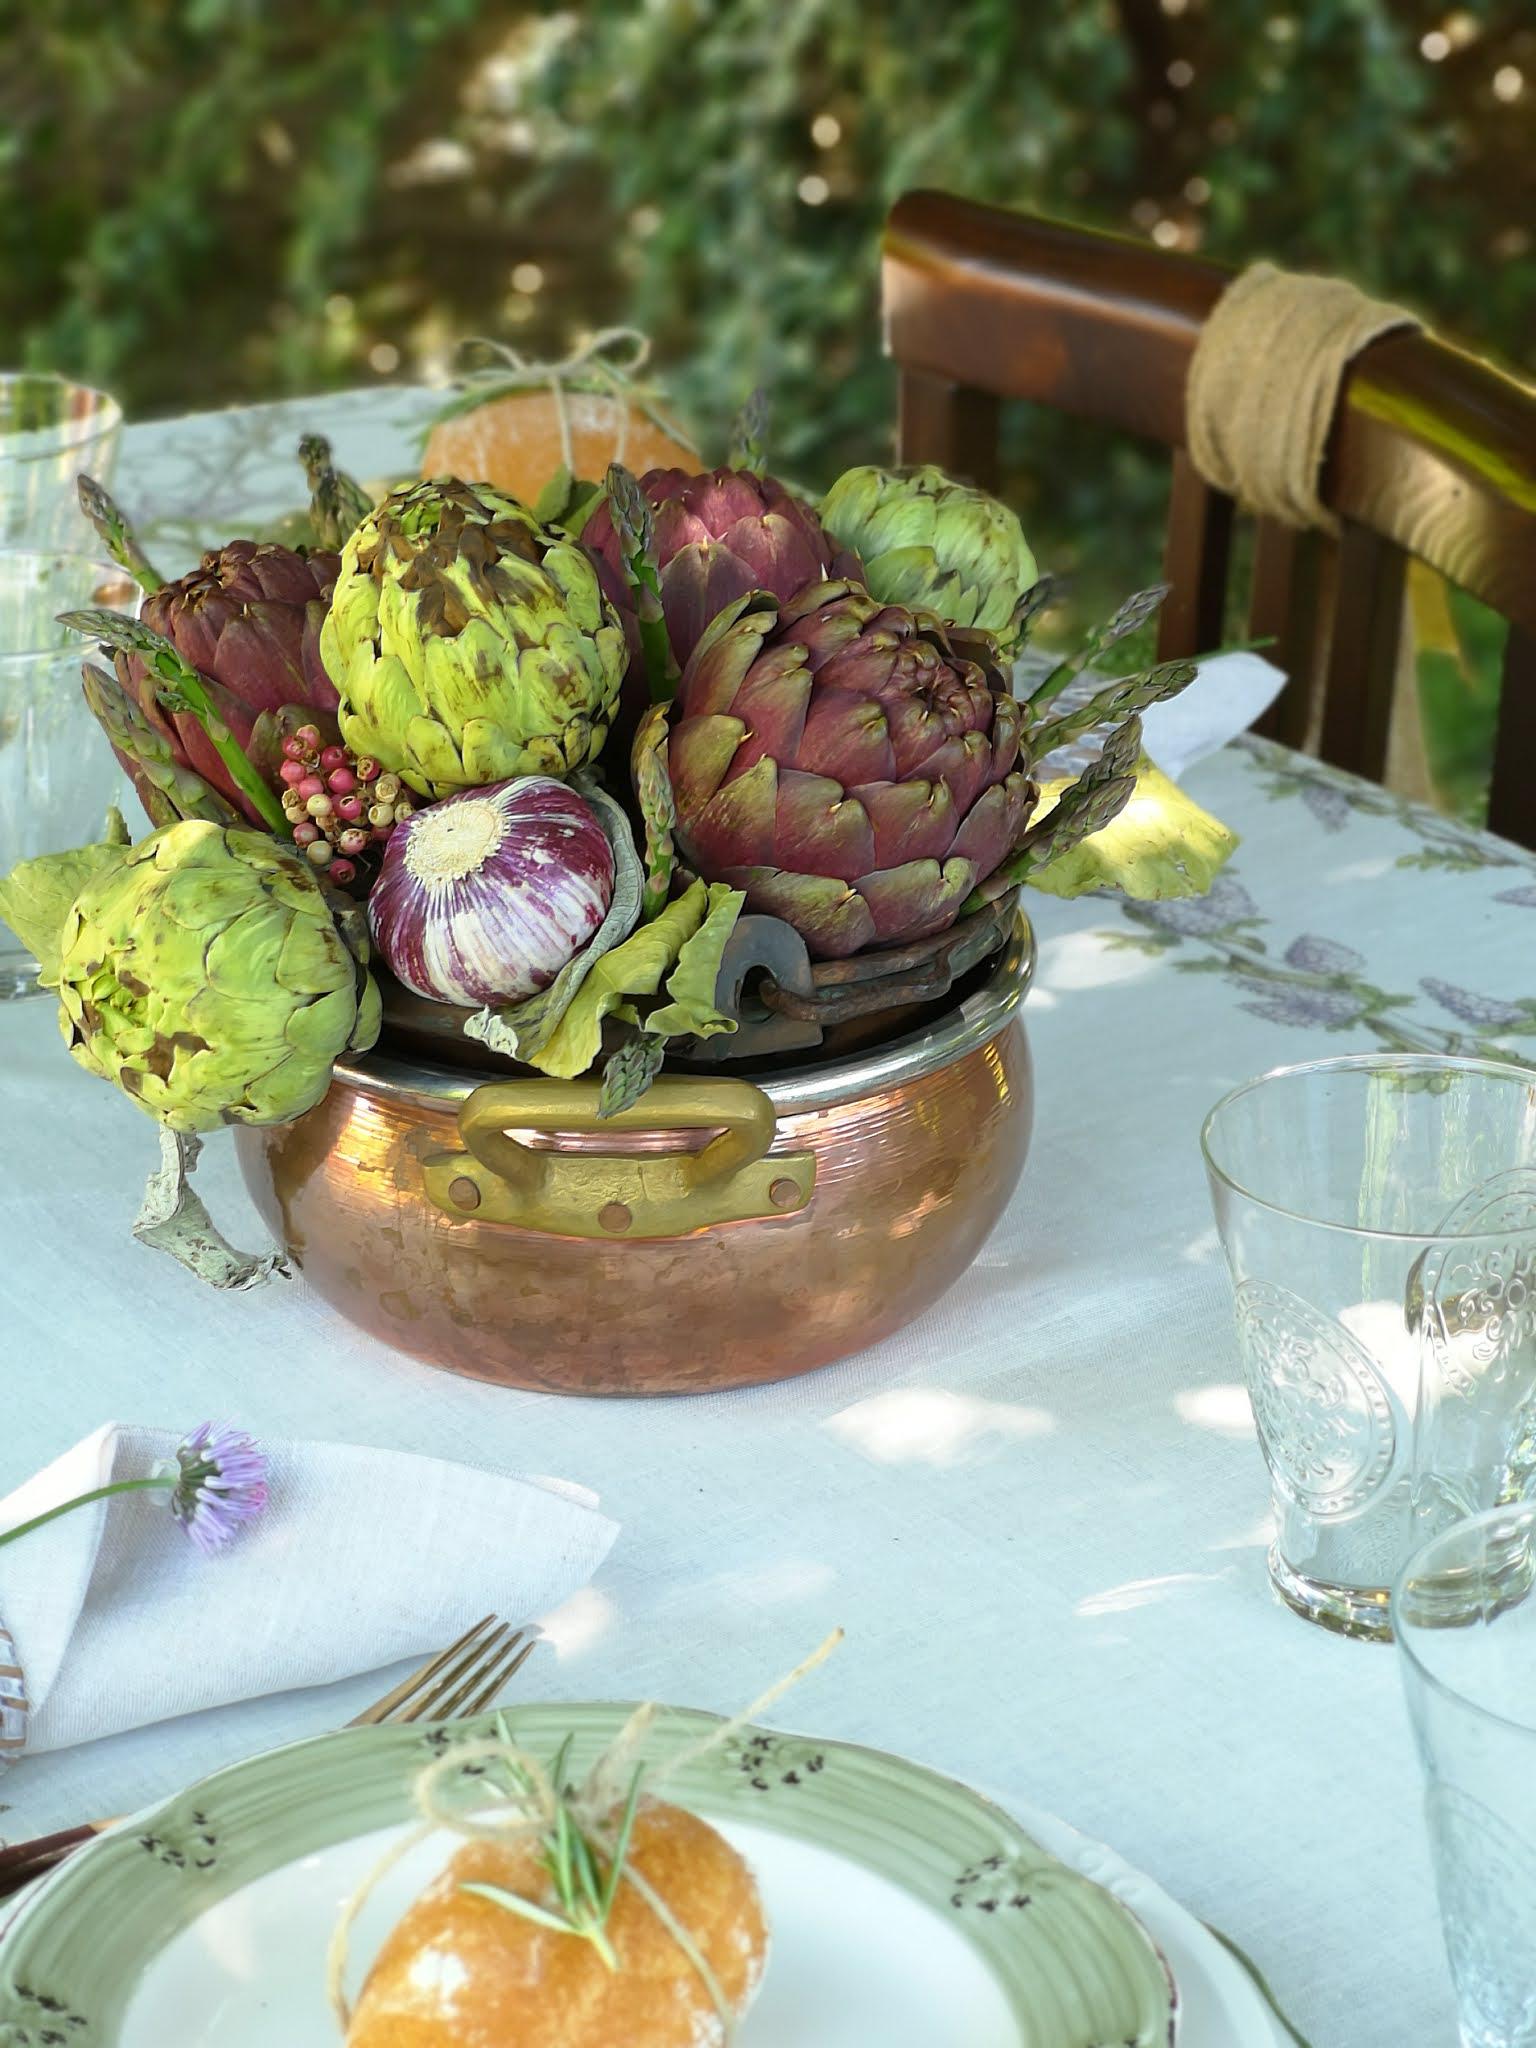 centrotavola con verdure